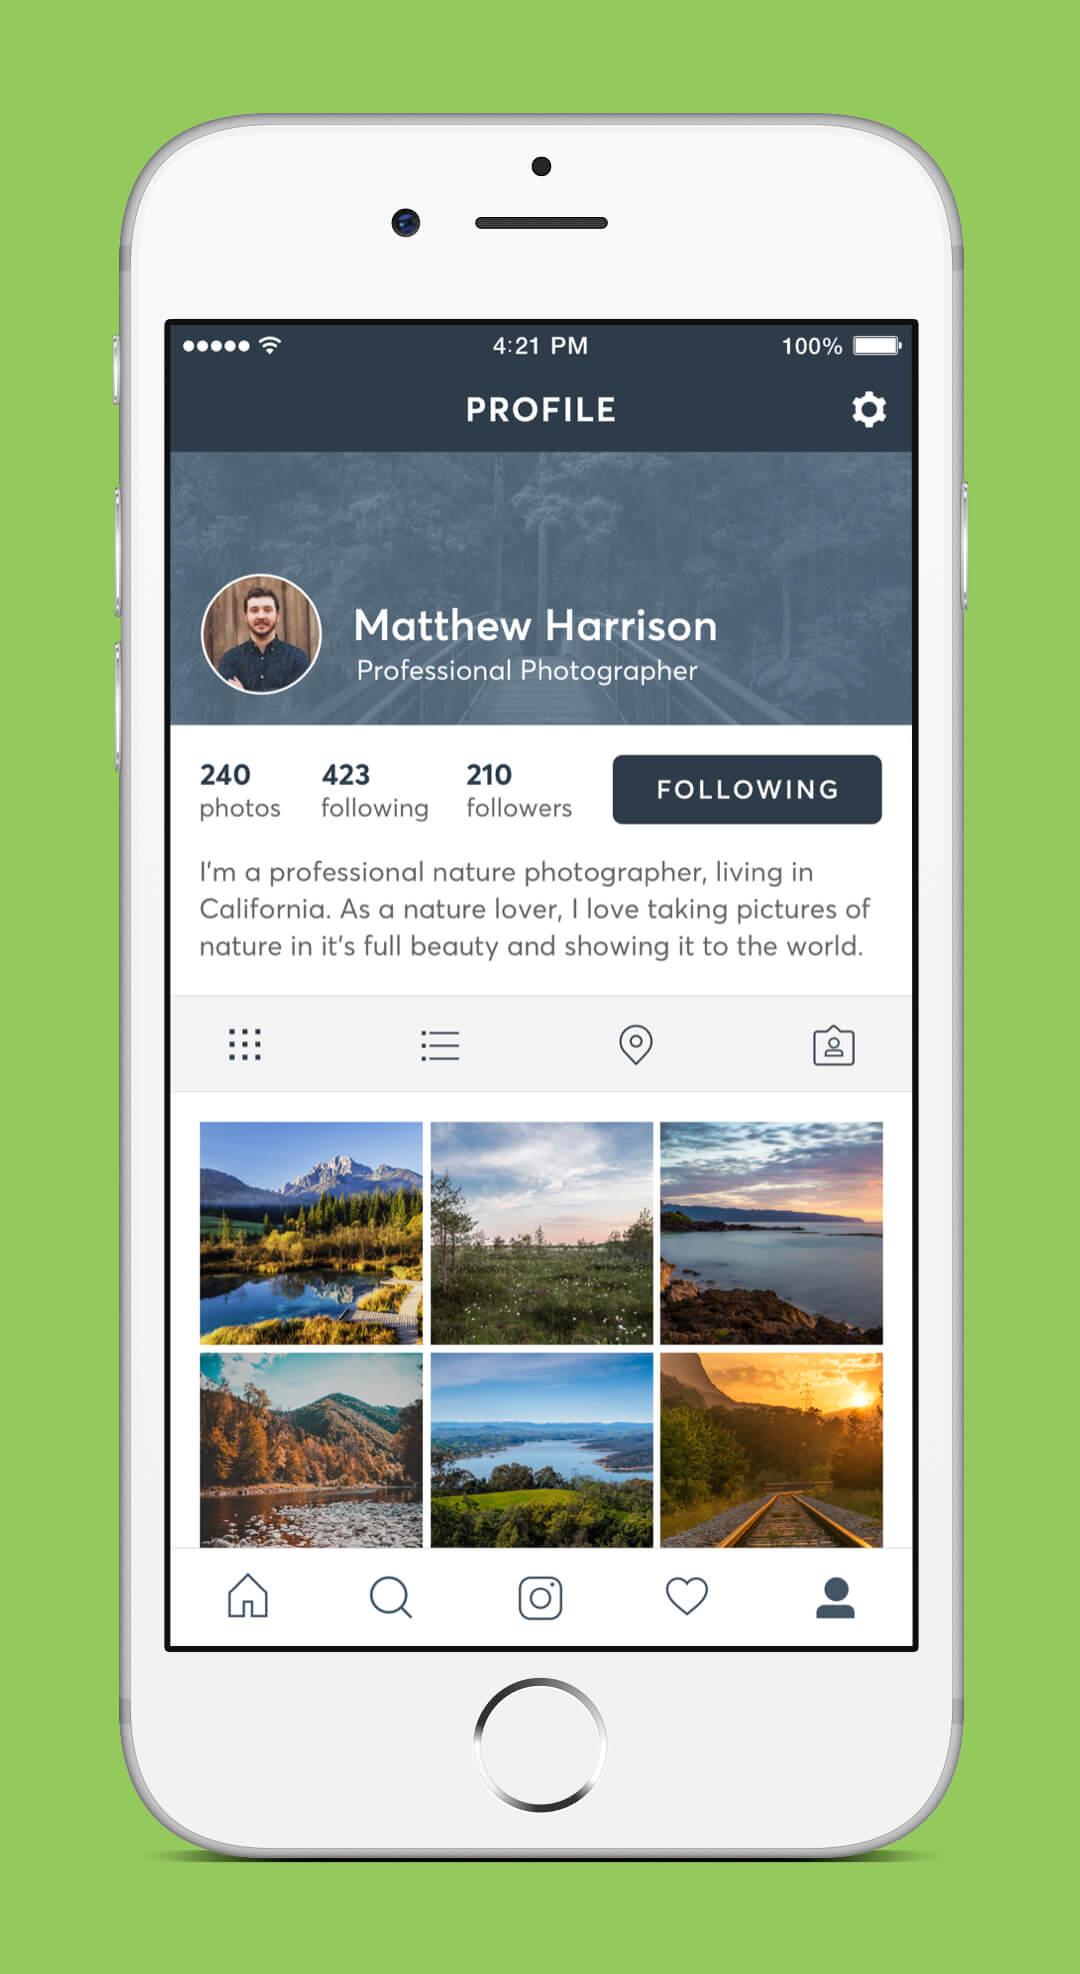 Instagram Redesign - Profile Screen